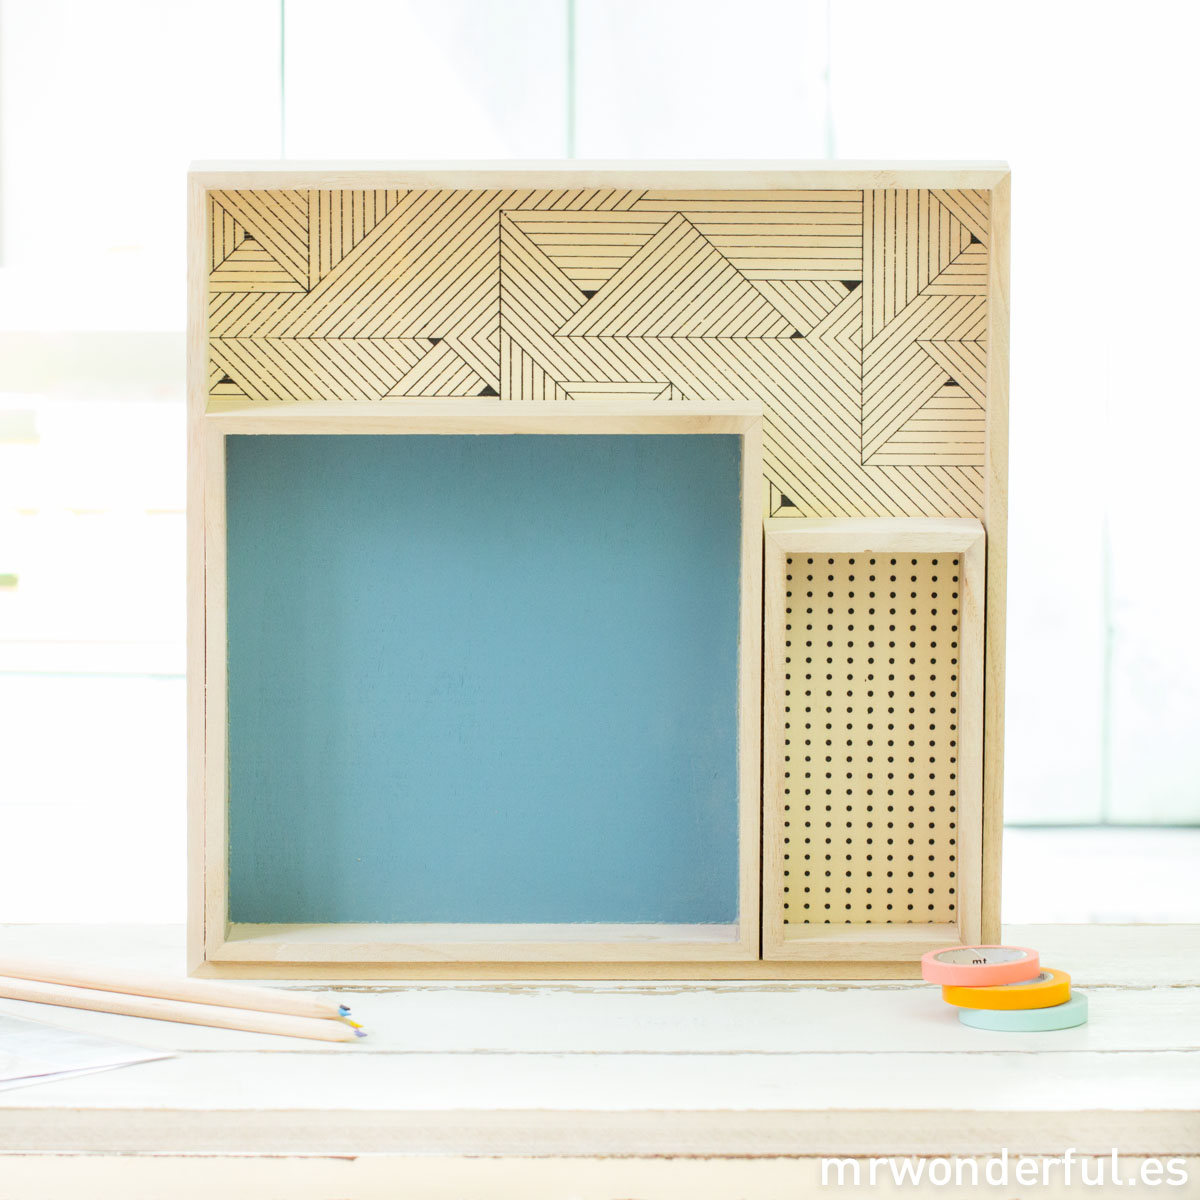 mrwonderful_SU0225_set-3-bandejas-madera-geometricas-9